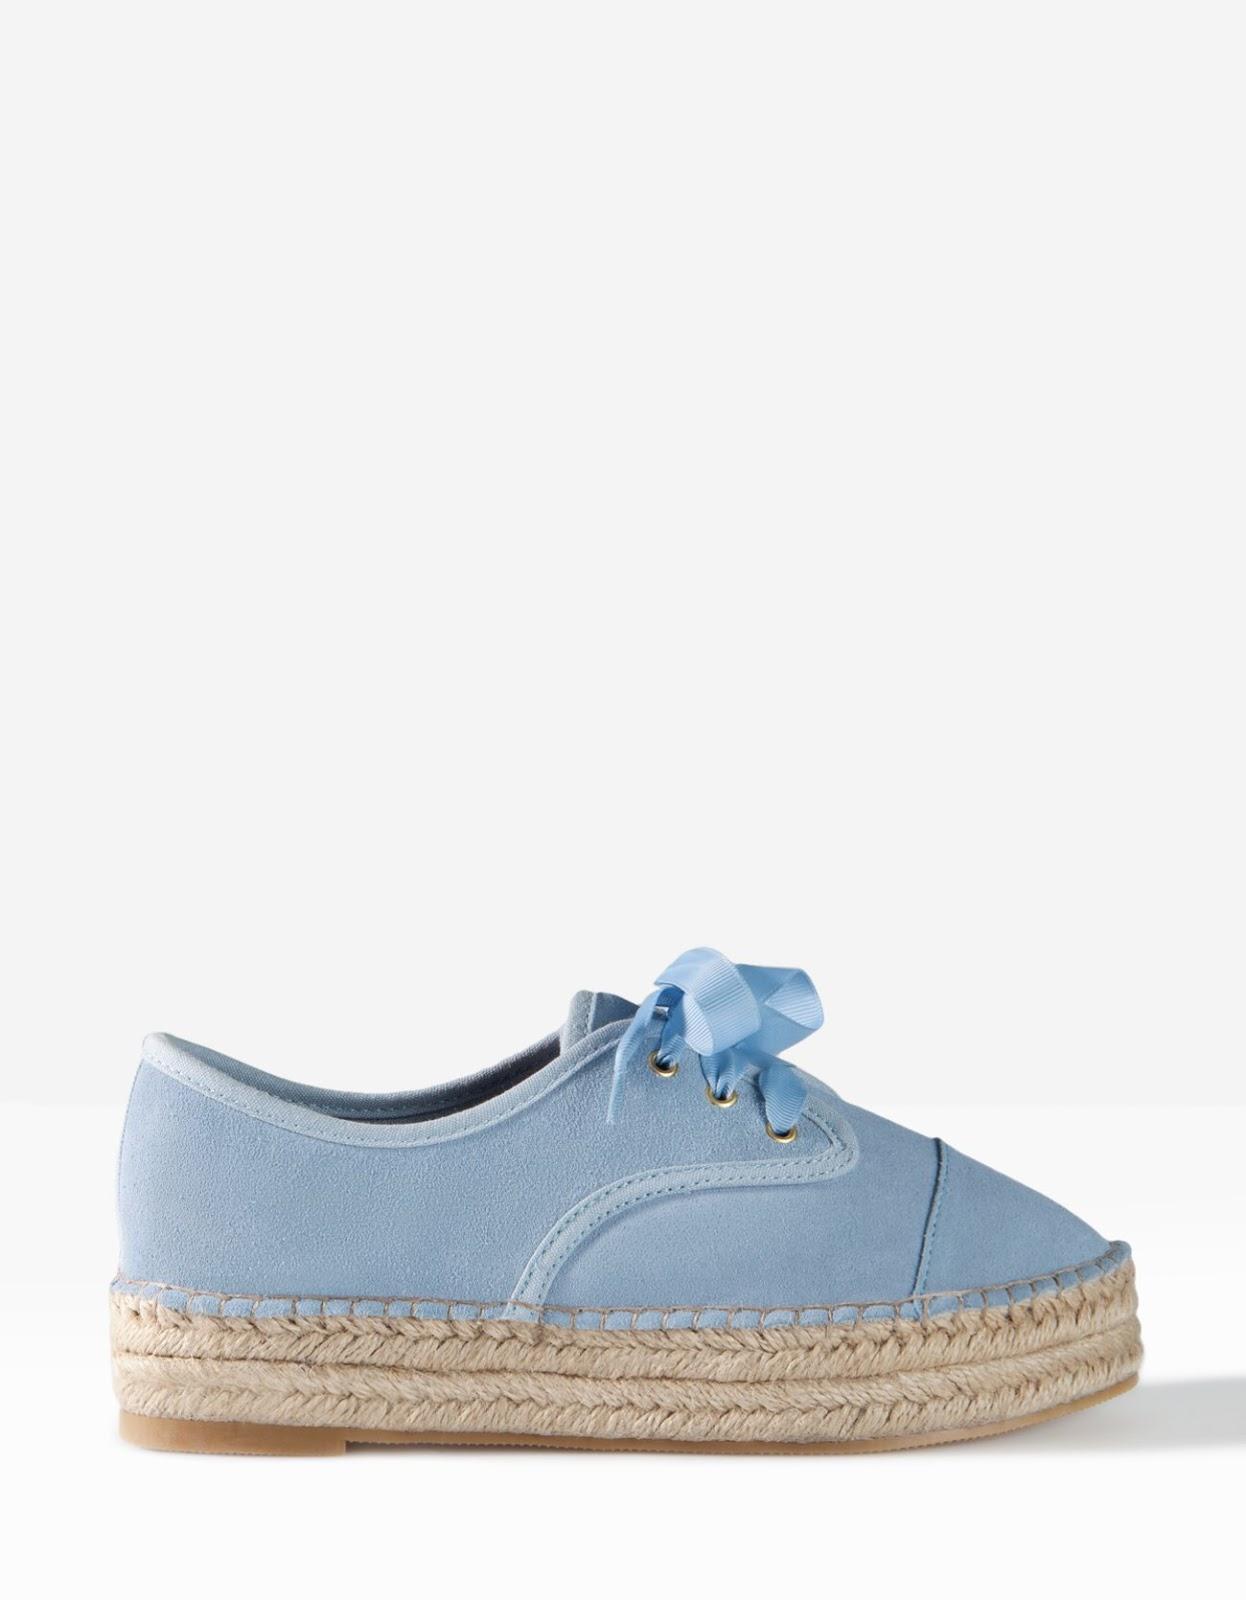 Top_zapatos_para_este_verano_2015_The_Pink_Graff_010